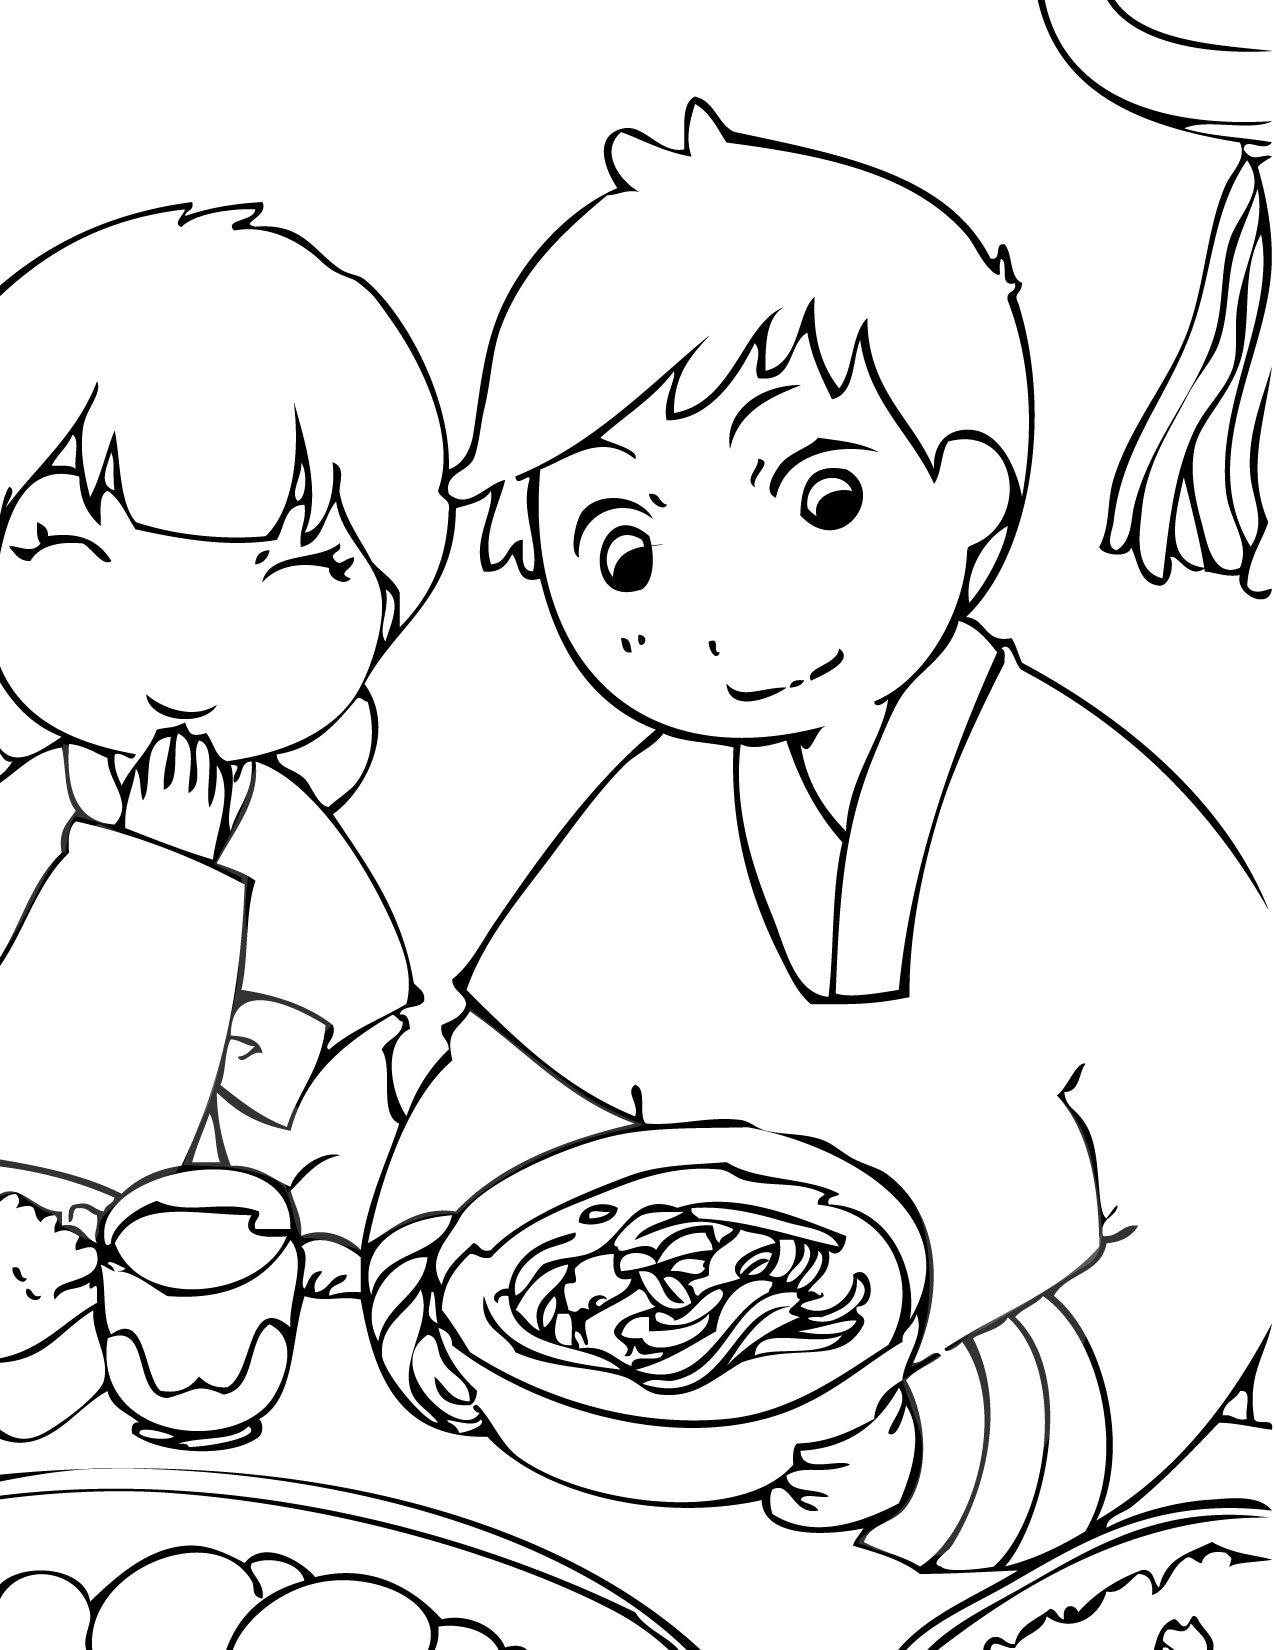 korea coloring page Print This